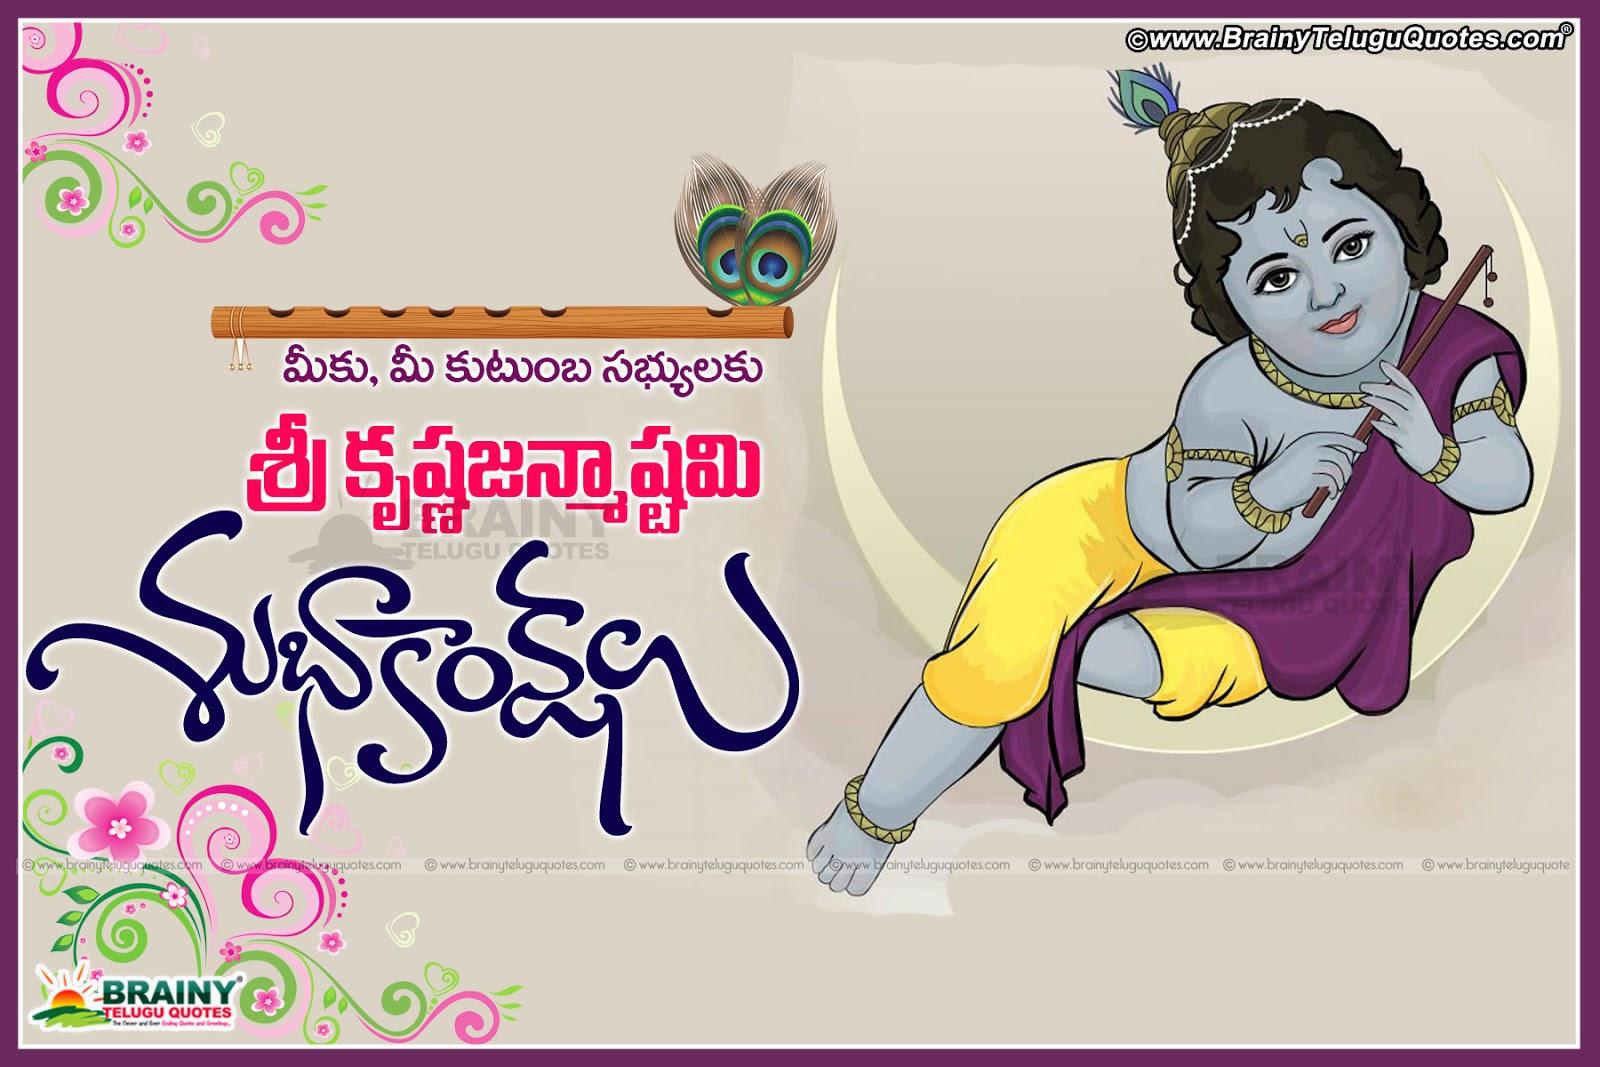 Lord Krishna Quotes Latest Telugu Quotes On Sri Krishna Janmashtami With Nice Hd